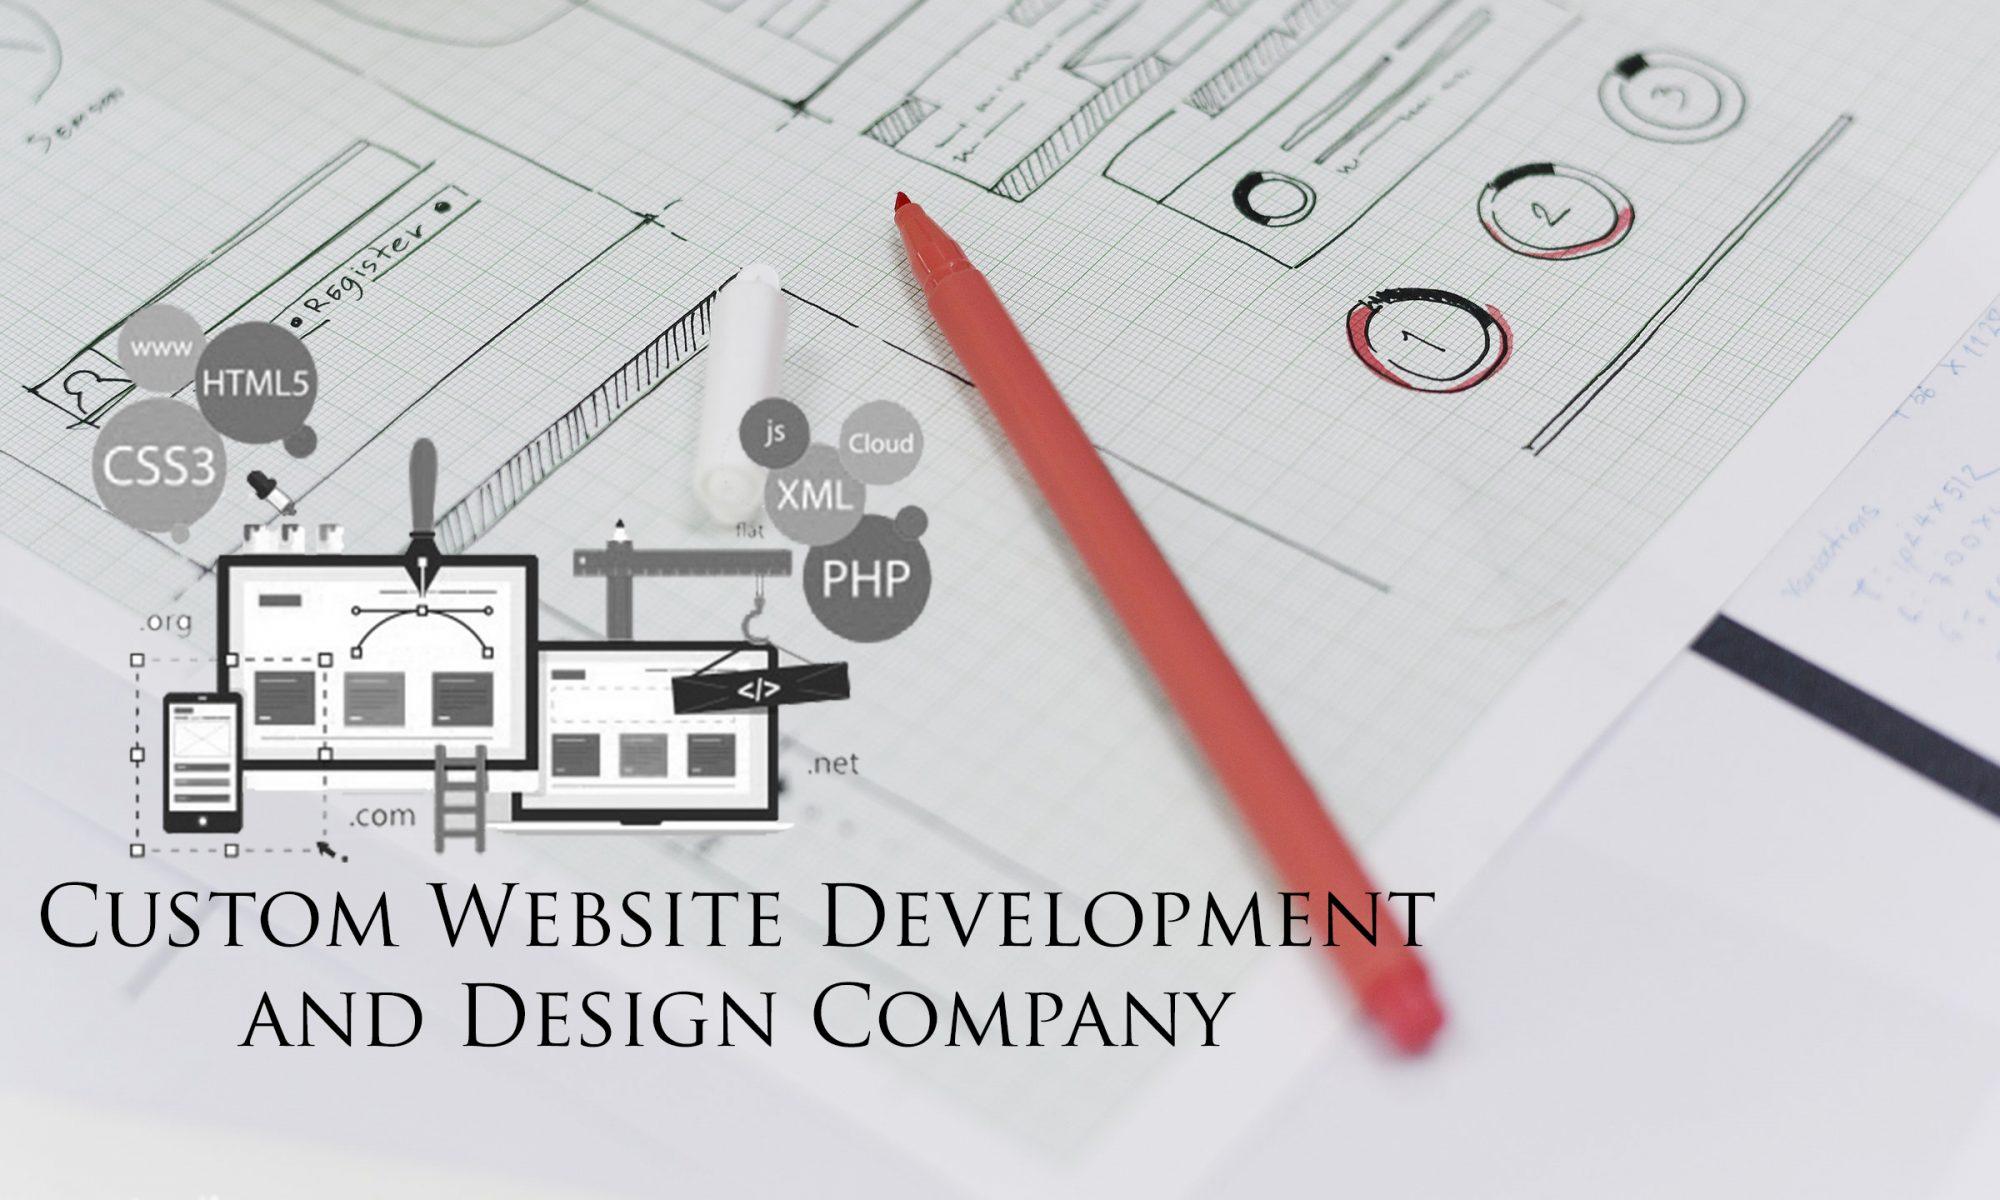 Custom Web Design and Development Company